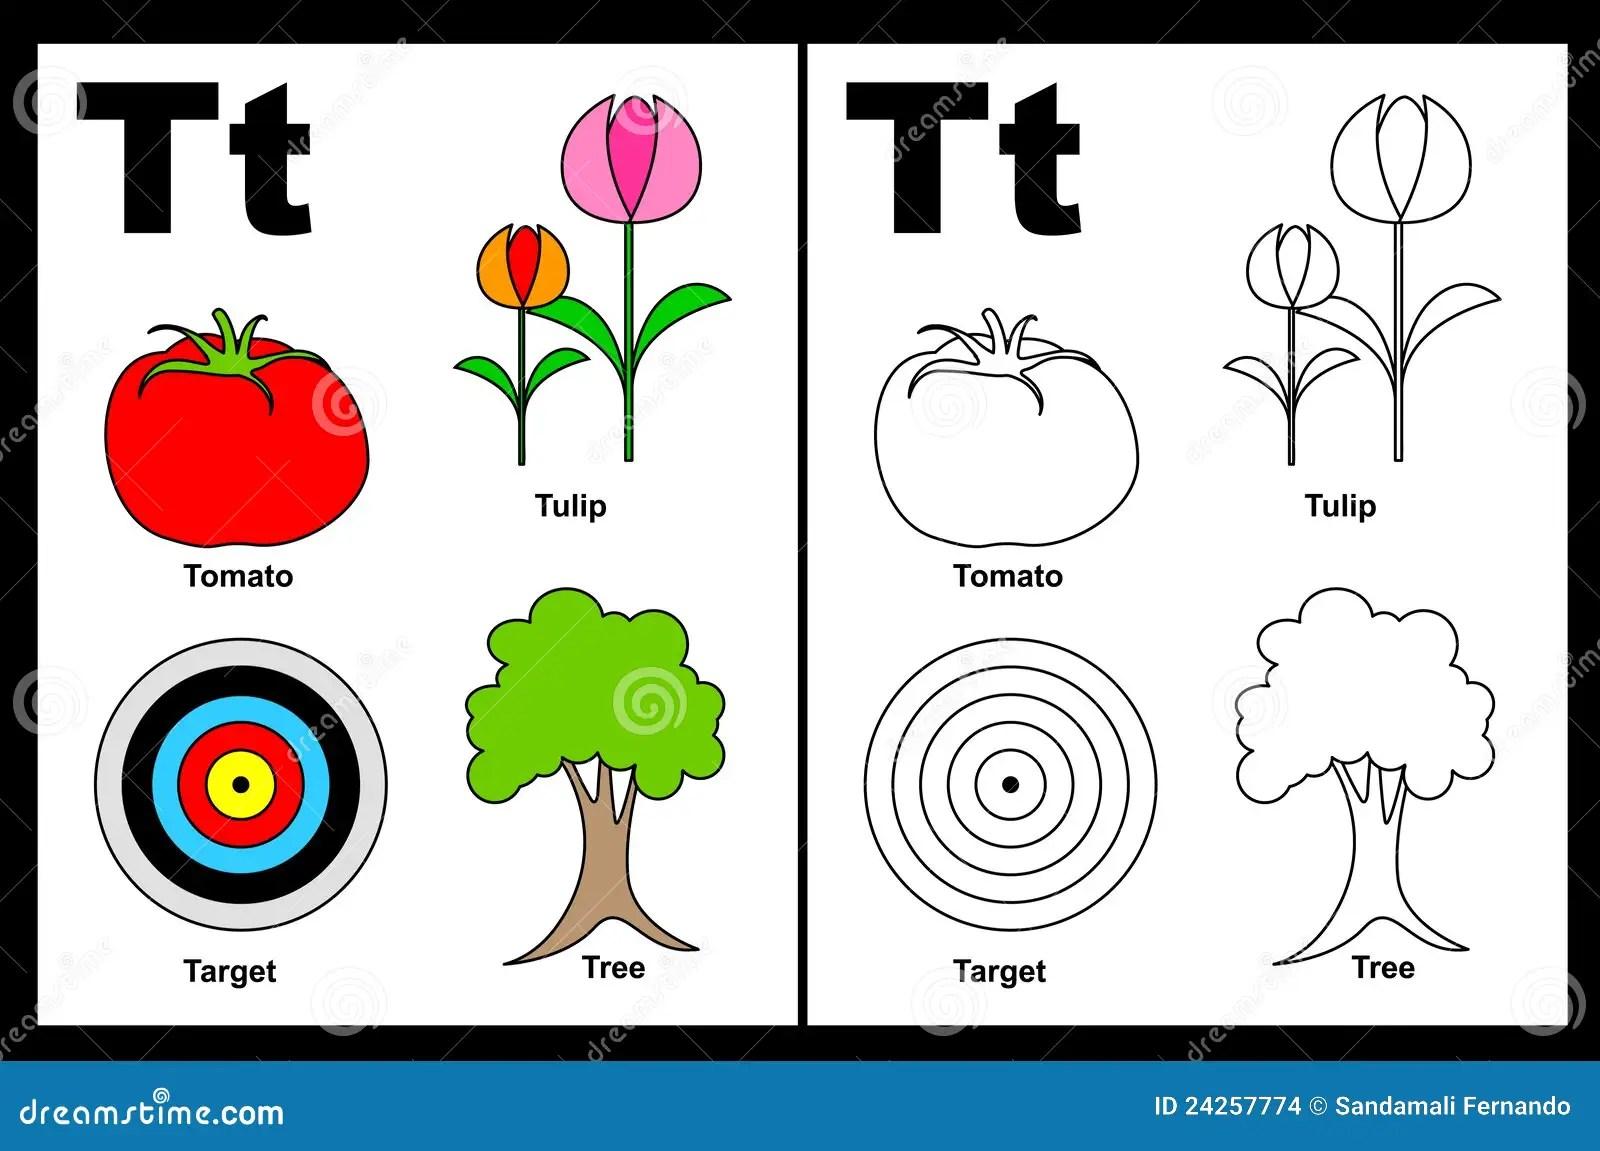 math worksheet : letter b tracing worksheet  job application letter for fresh graduate : Letter T Worksheets For Kindergarten